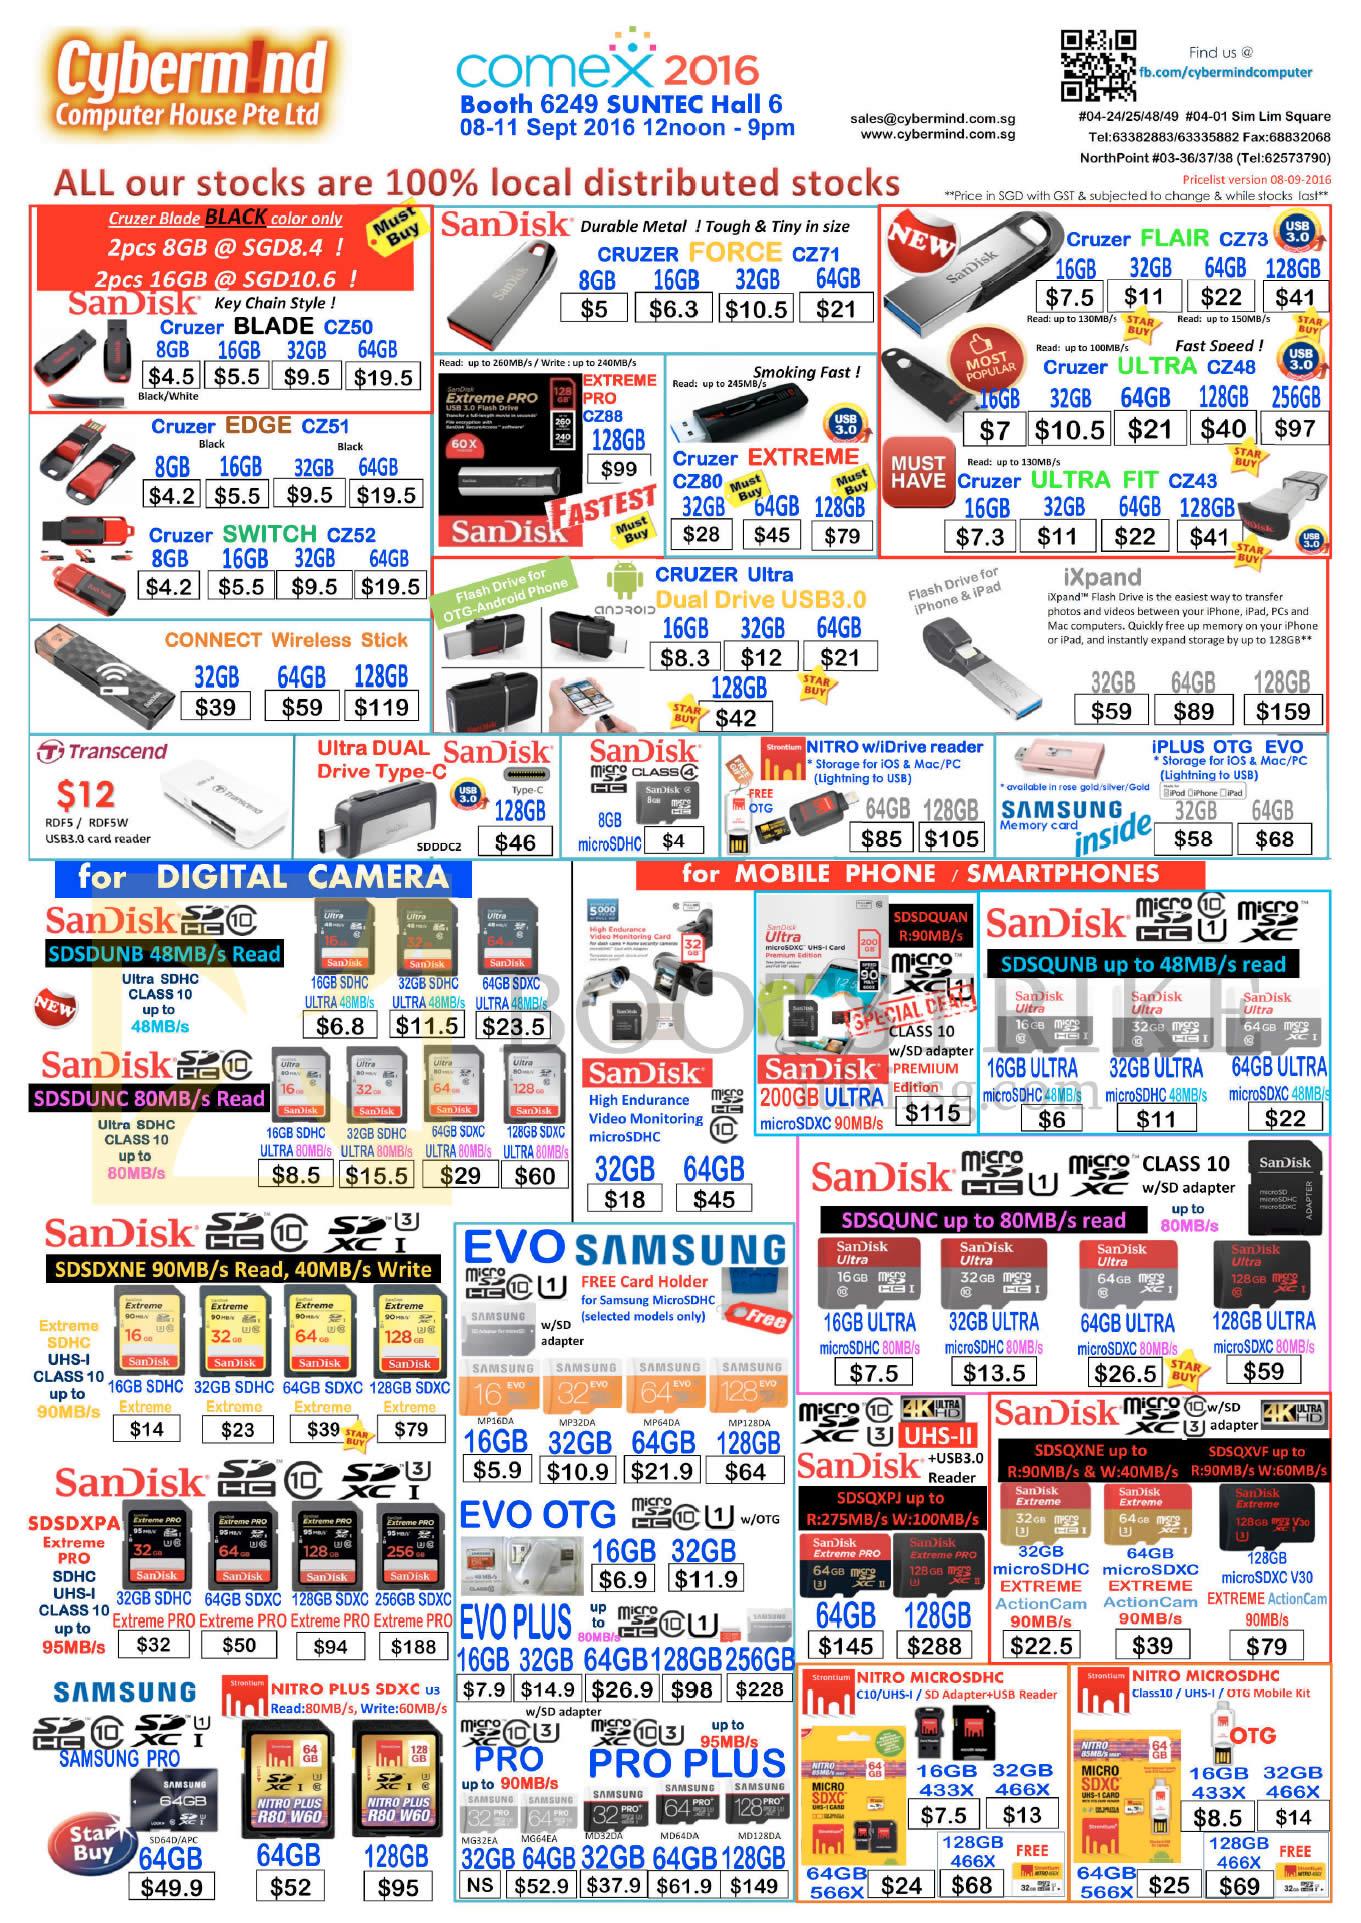 COMEX 2016 price list image brochure of Cybermind Accessories Thumb Drives, SD Cards, SanDisk, Transcend, Nitro MicroSDHC, IXPand, Samsung EVO